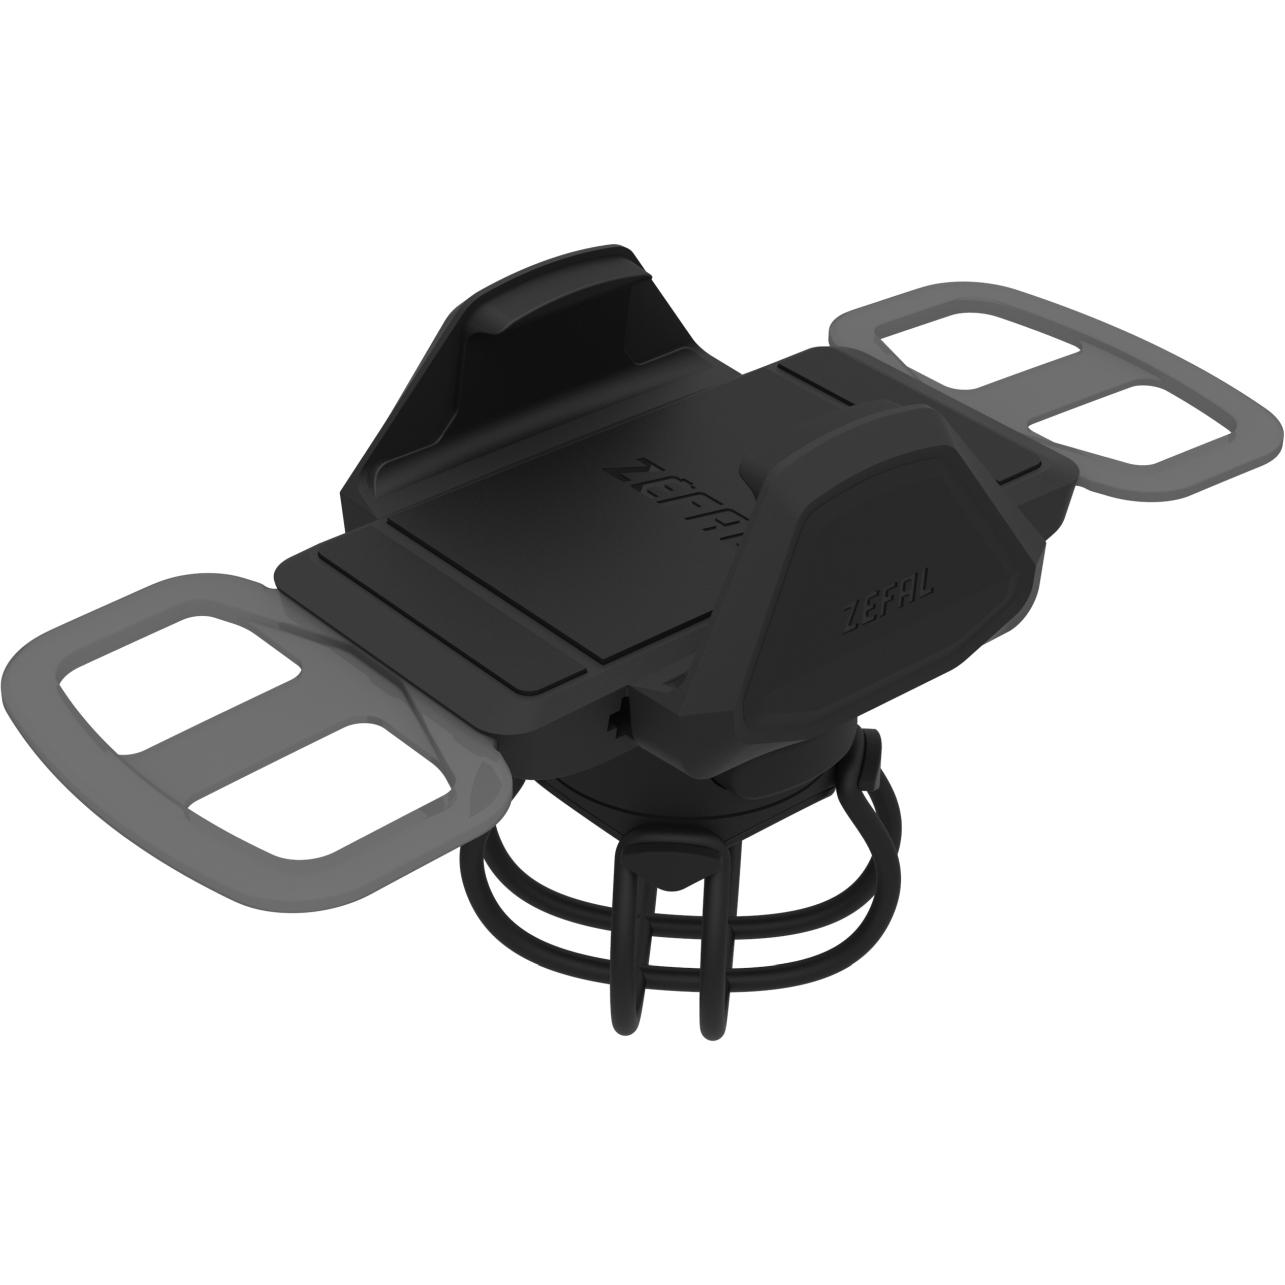 Zéfal Universal Phone Holder Smartphonehalterung - black